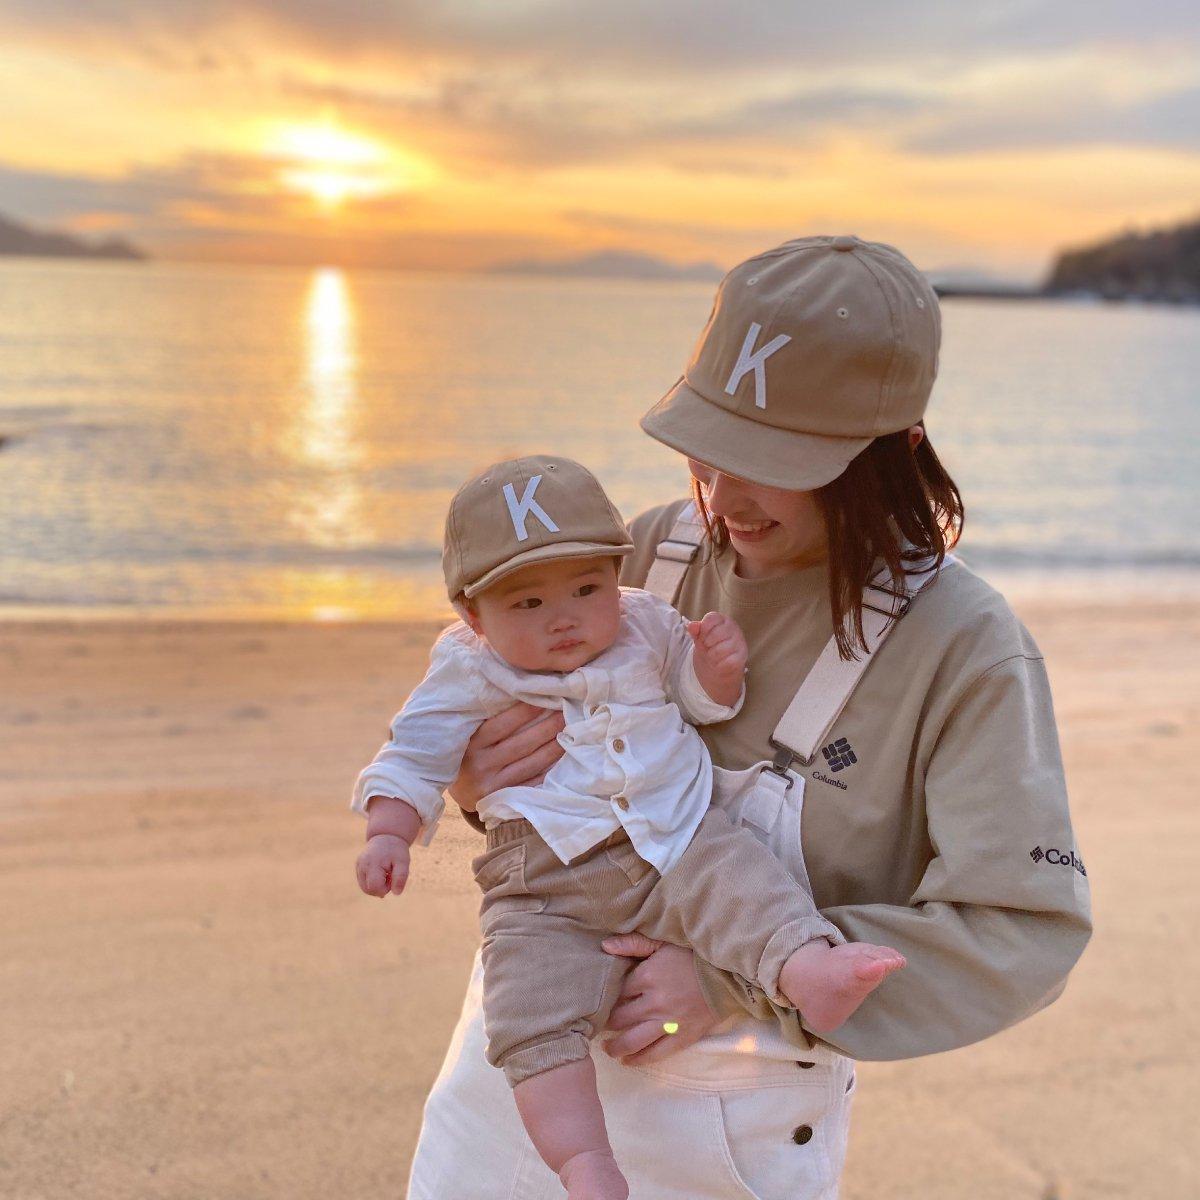 【BABY】Baby Sim Logo Cap 詳細画像26